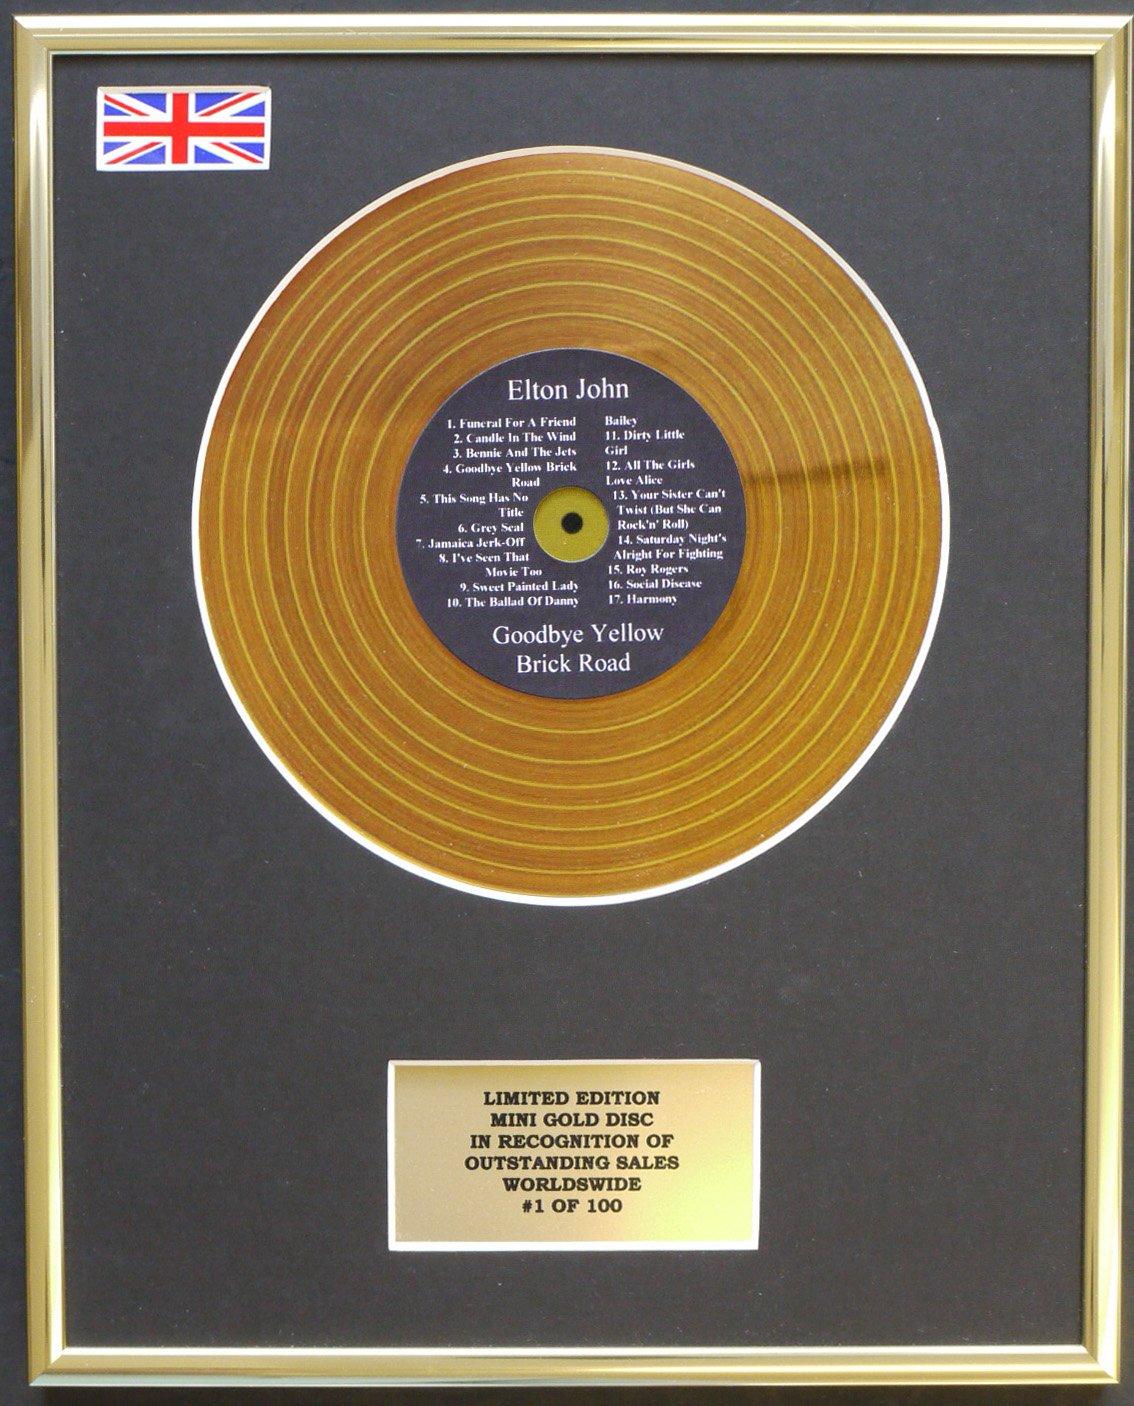 ELTON JOHN/MINI GOLD DISC DISPLAY/LIMITED EDITION/COA/GOODBYE YELLOW BRICK ROAD Everythingcollectible